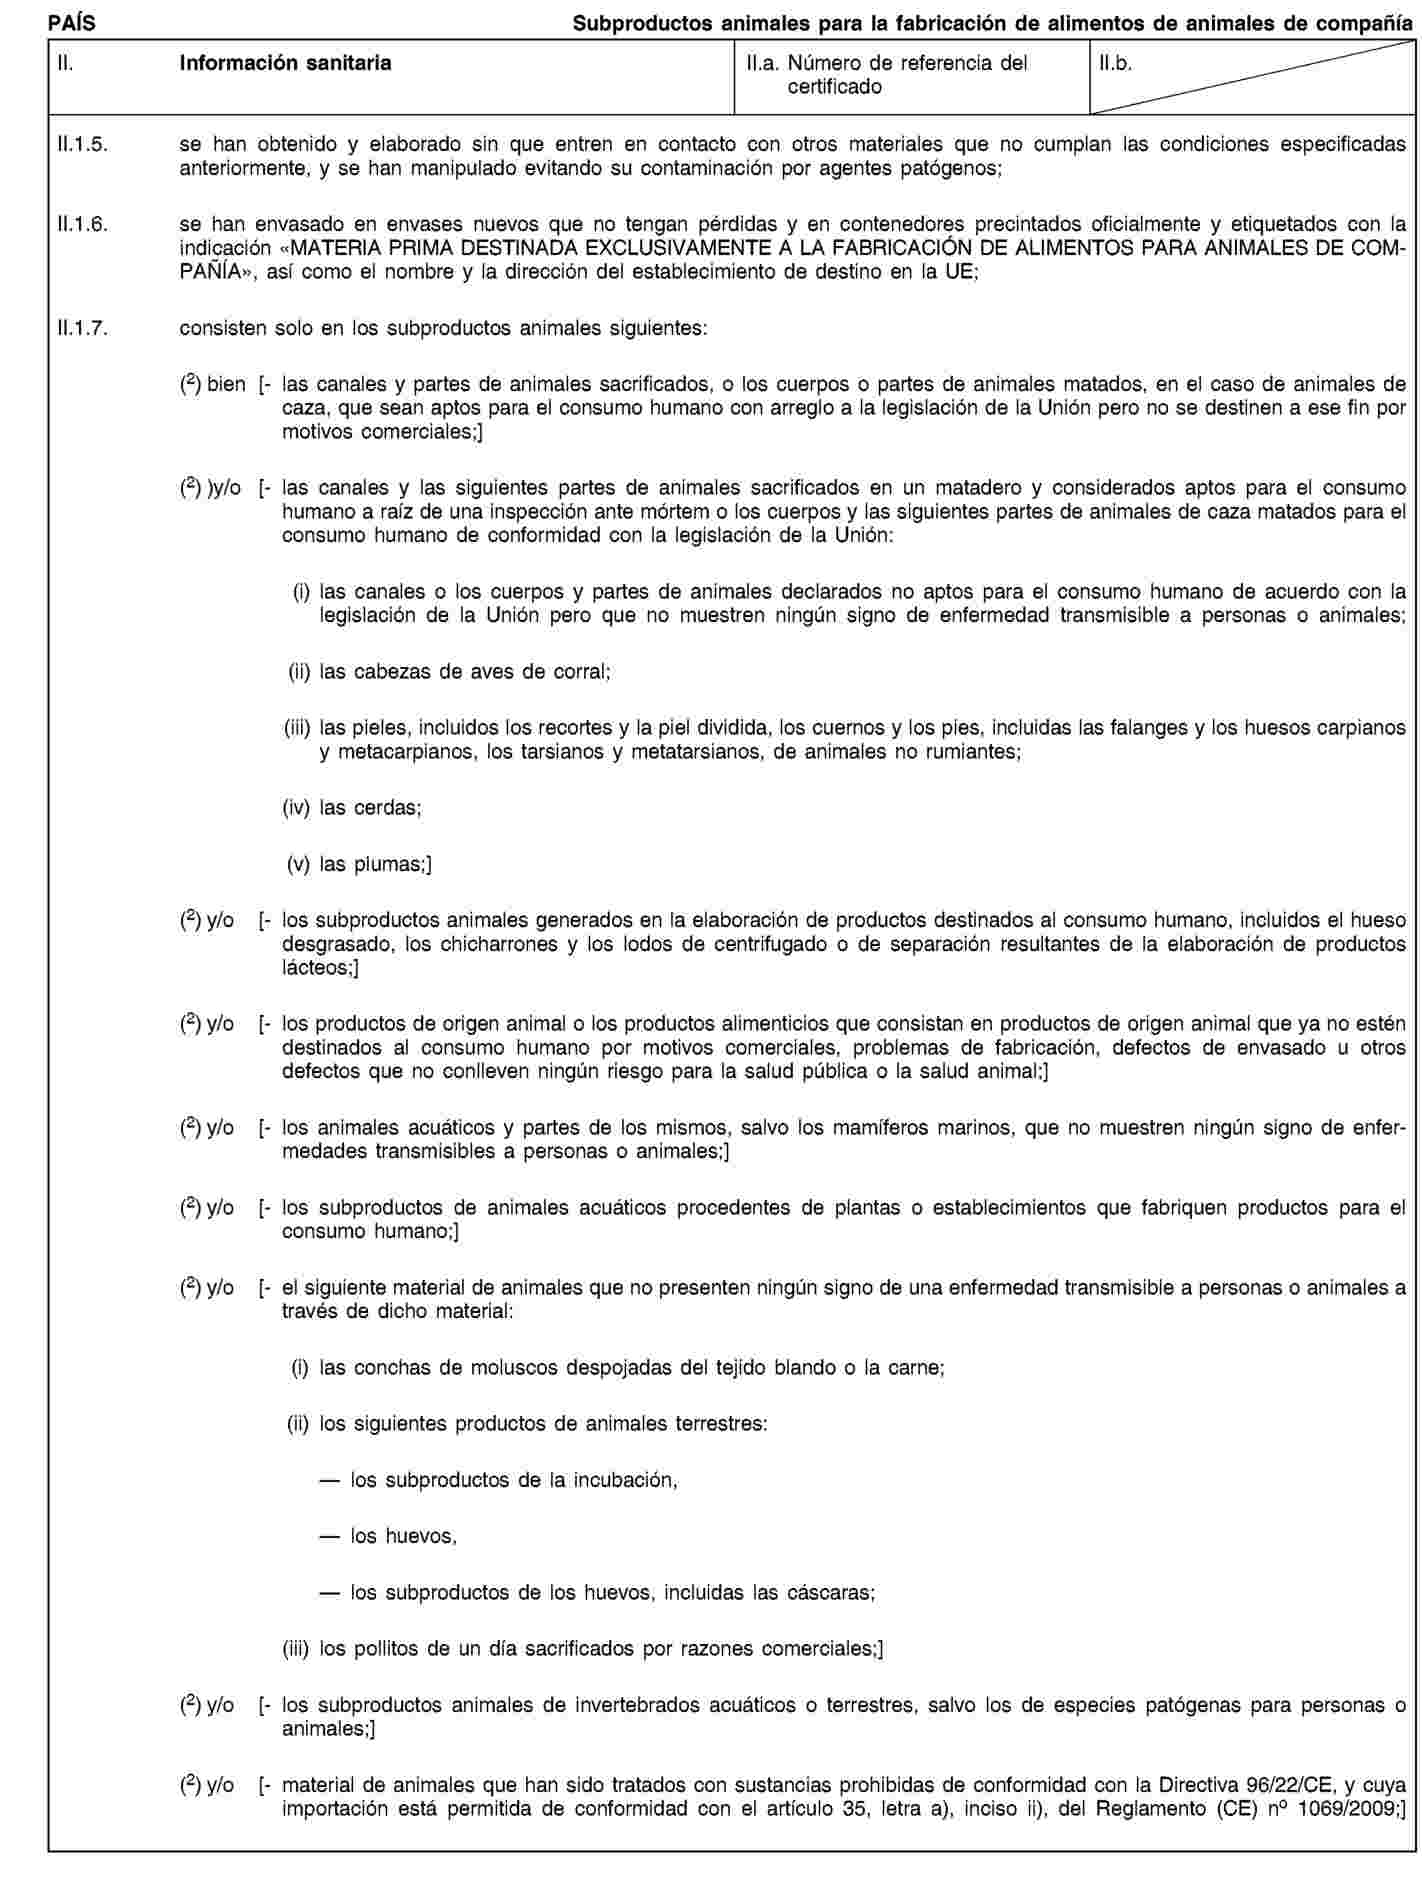 Imagen: https://eur-lex.europa.eu/resource.html?uri=uriserv:OJ.L_.2011.054.01.0001.01.SPA.xhtml.L_2011054ES.01015701.tif.jpg